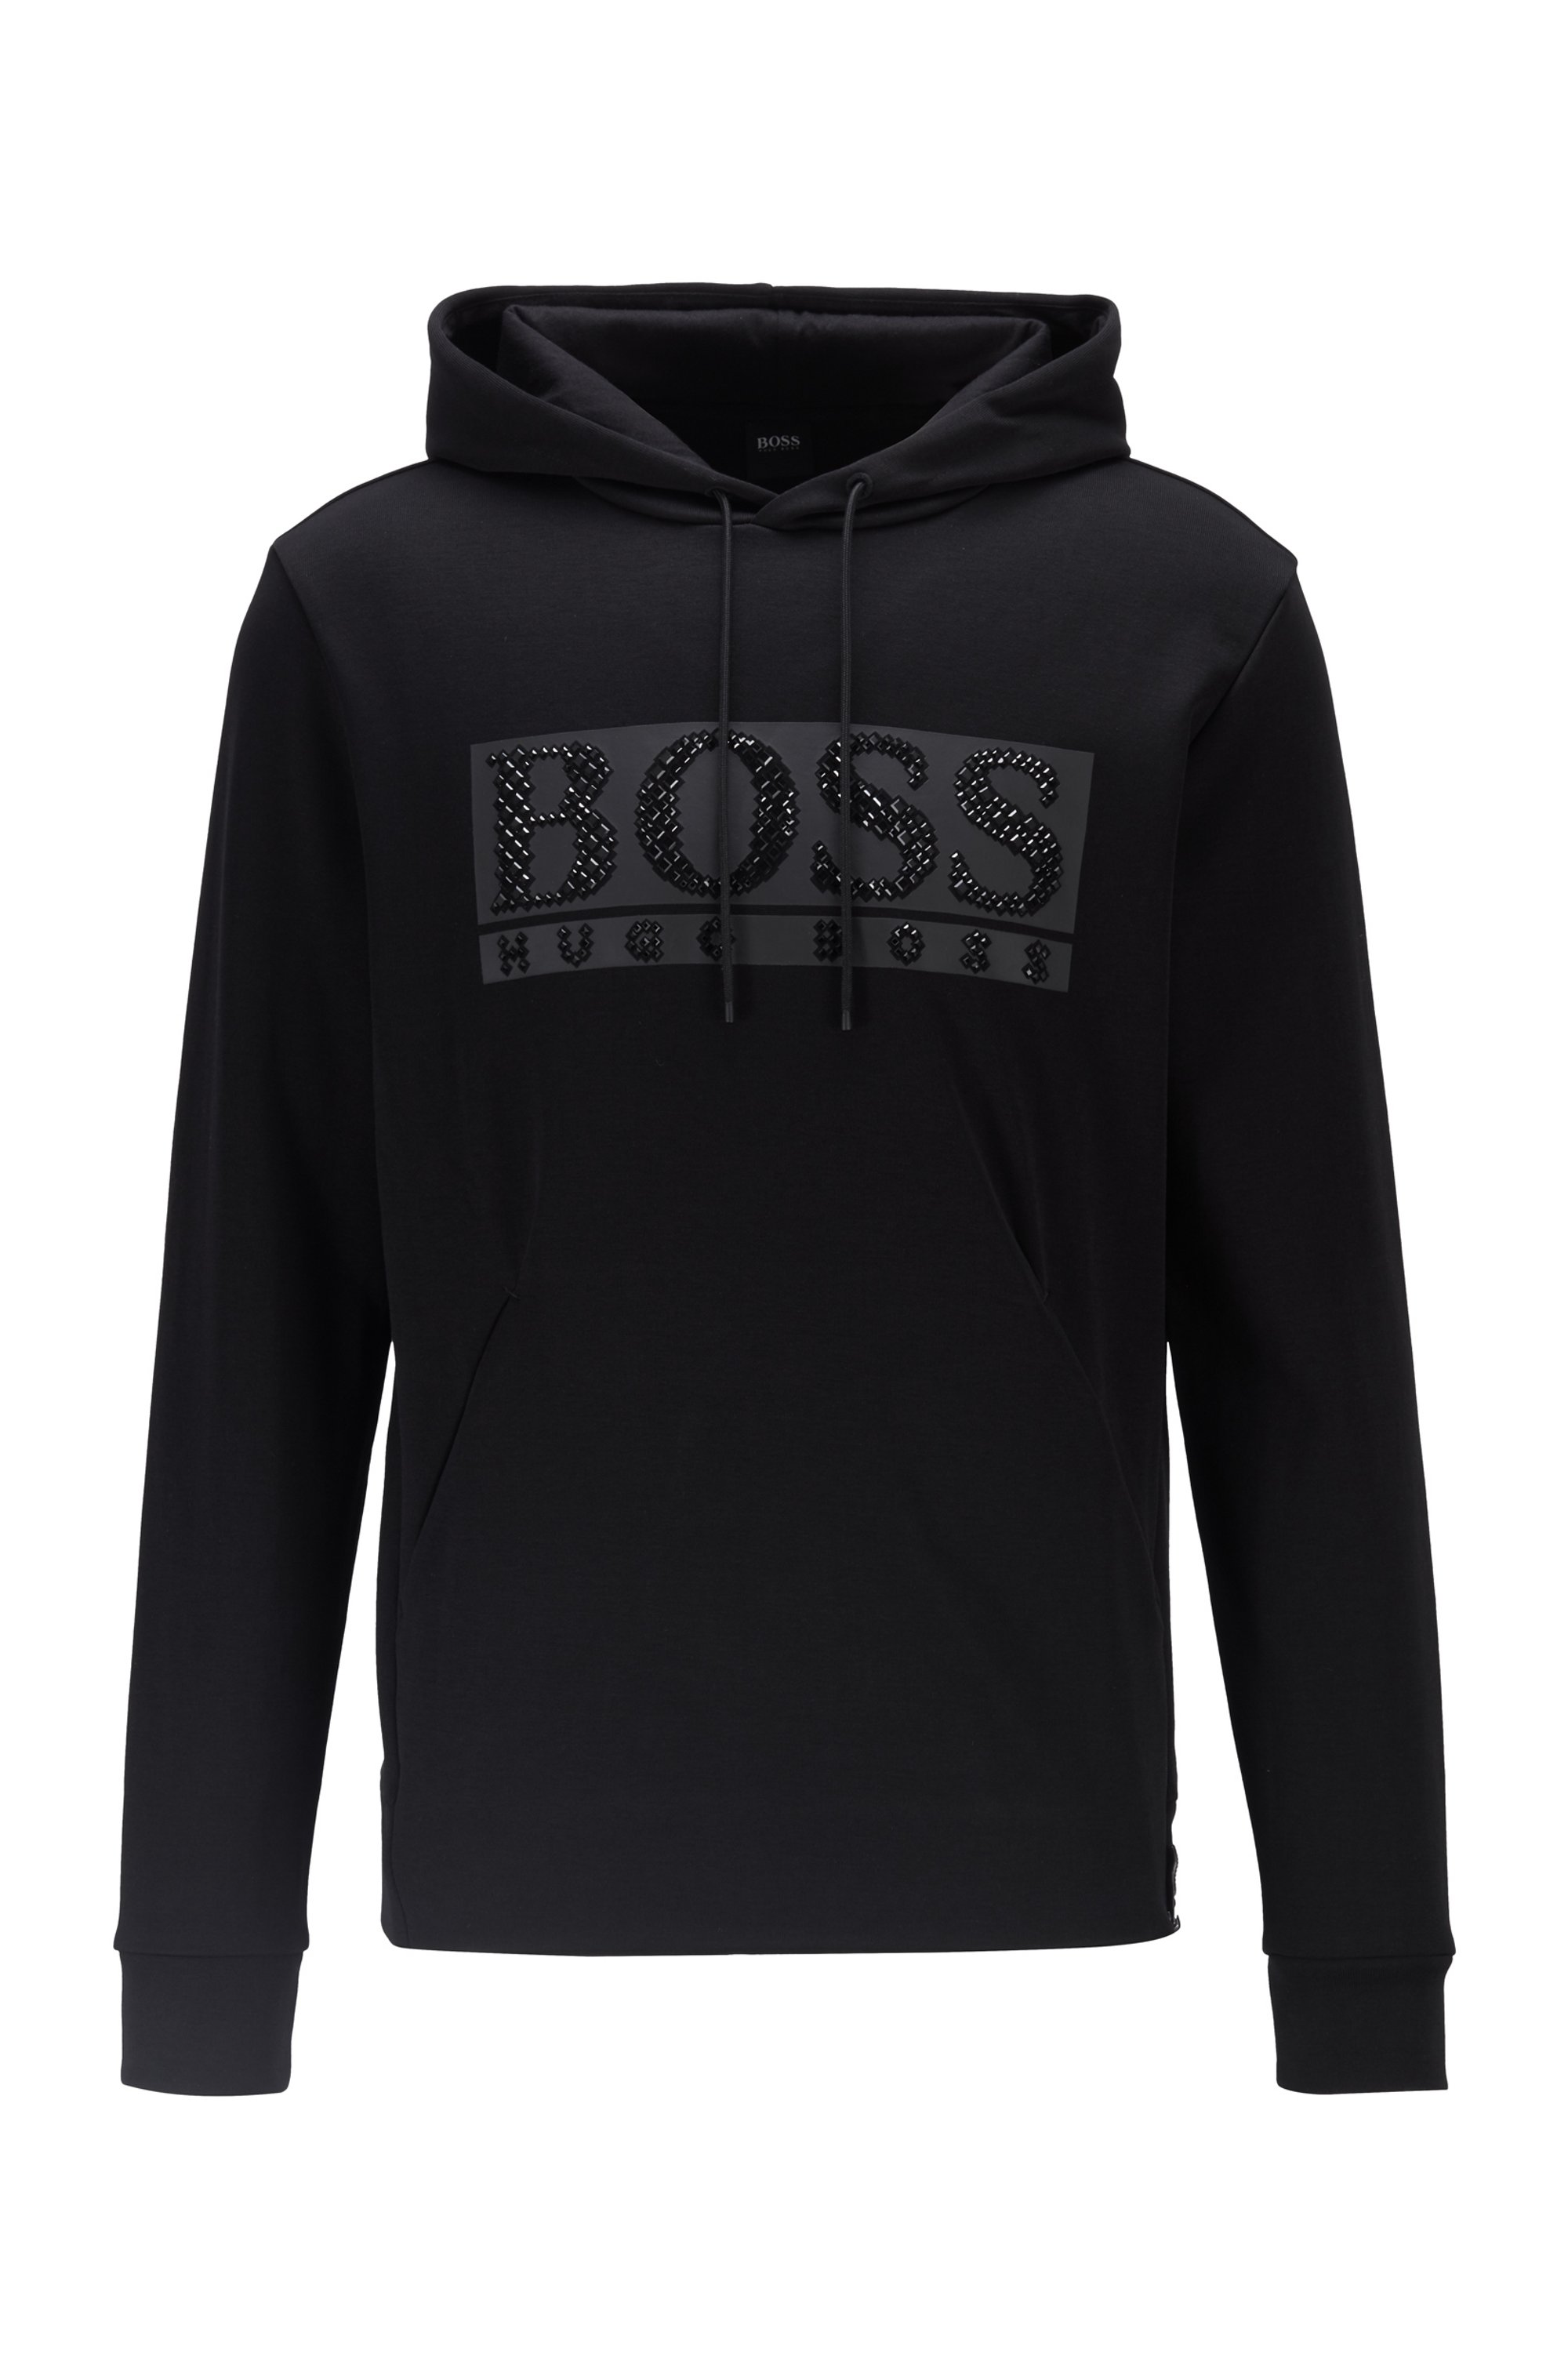 Cotton-blend hooded sweatshirt with rhinestone logo, Black